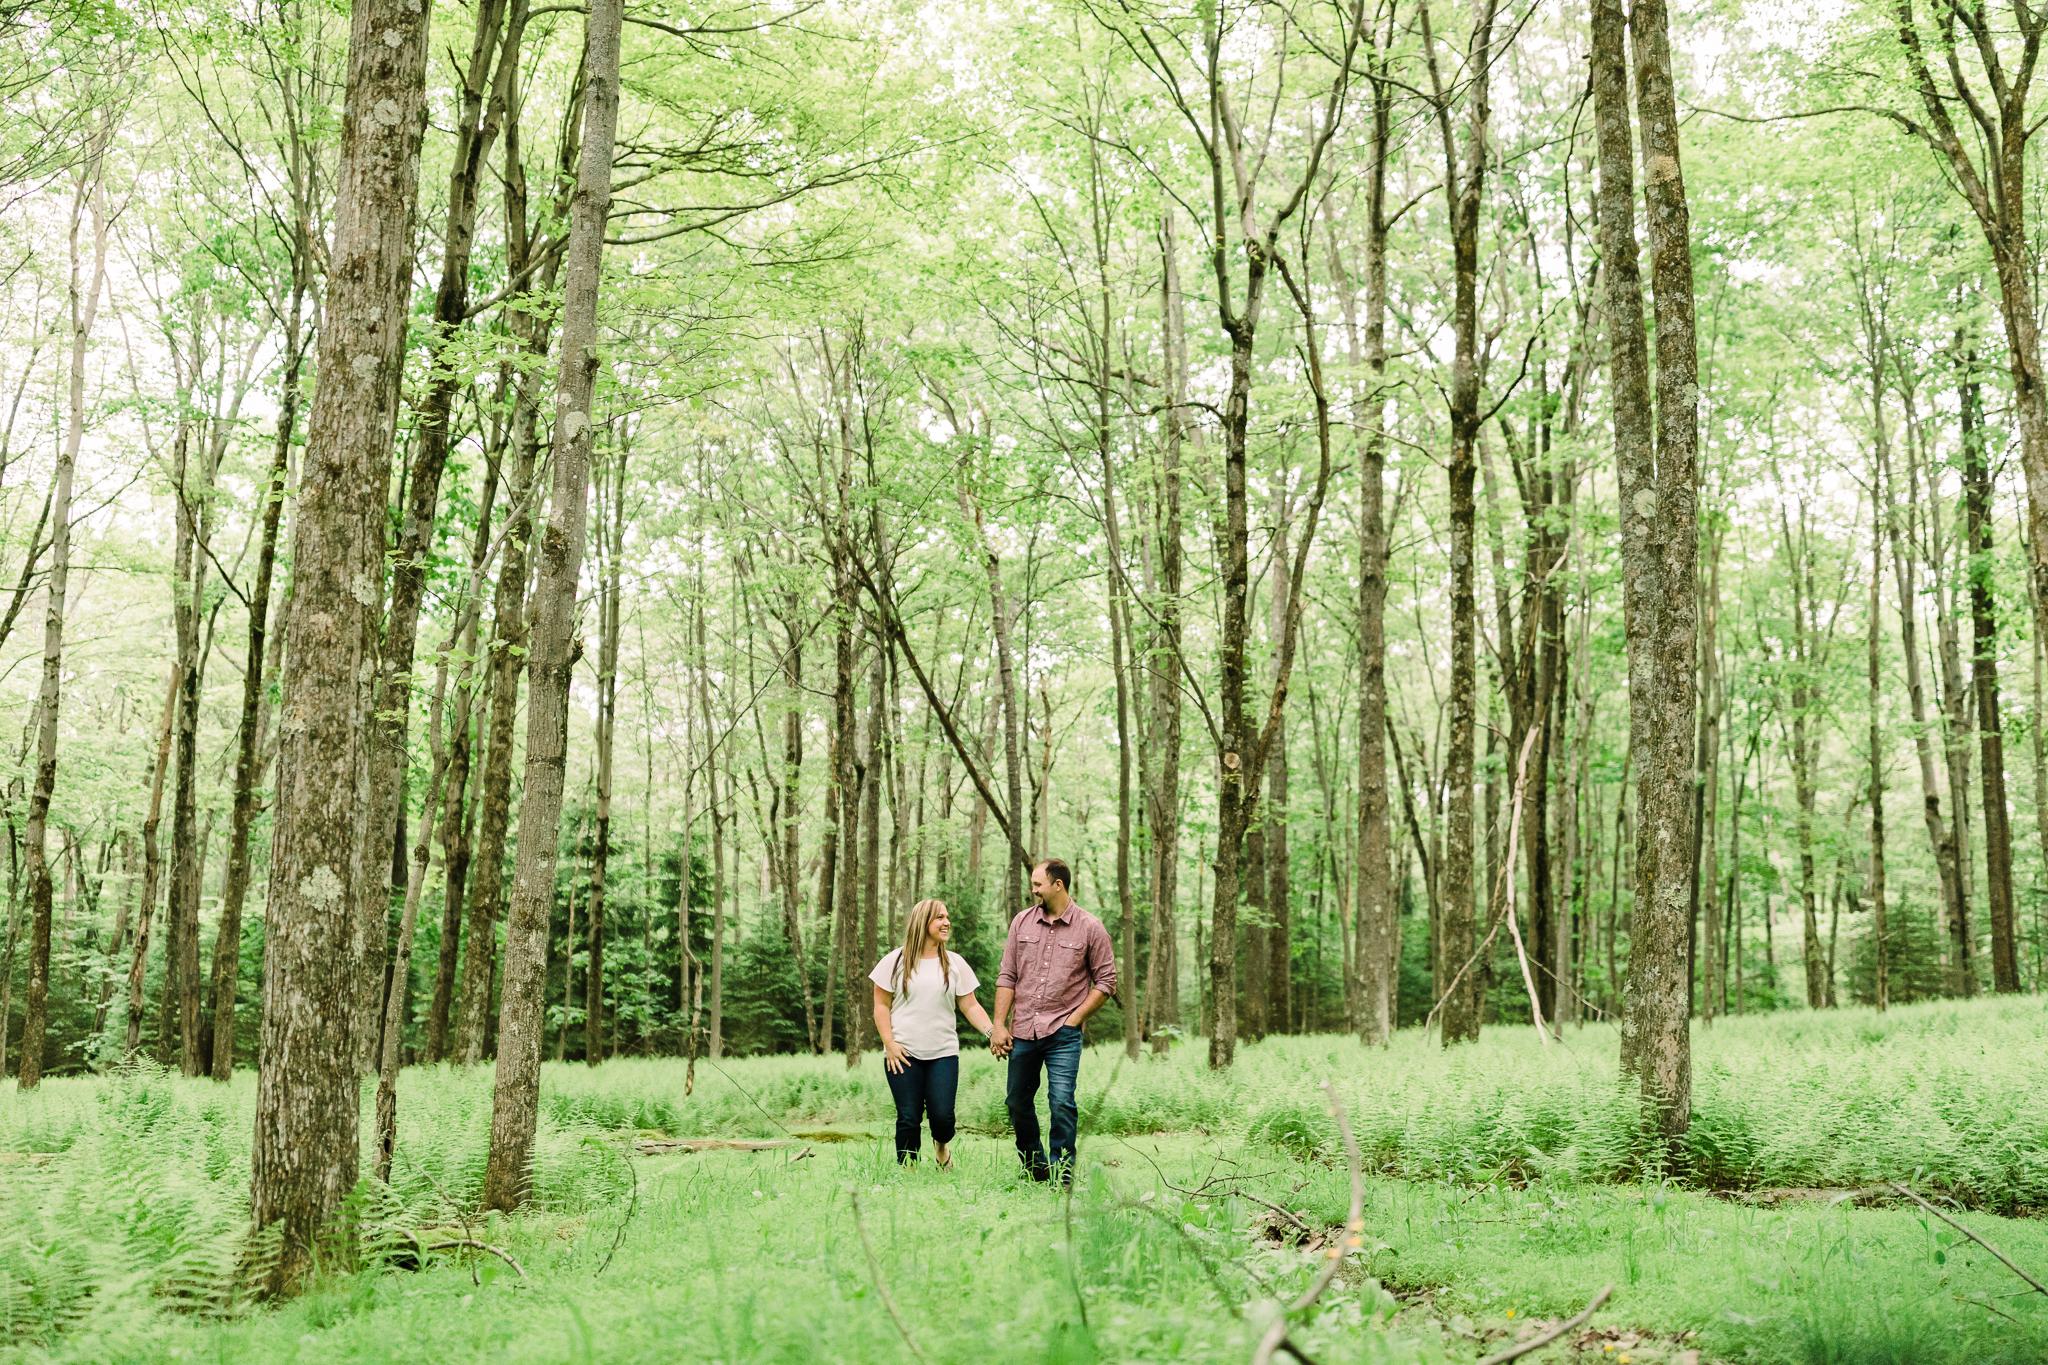 Kettle-creek-state-park-engagement-9774.jpg